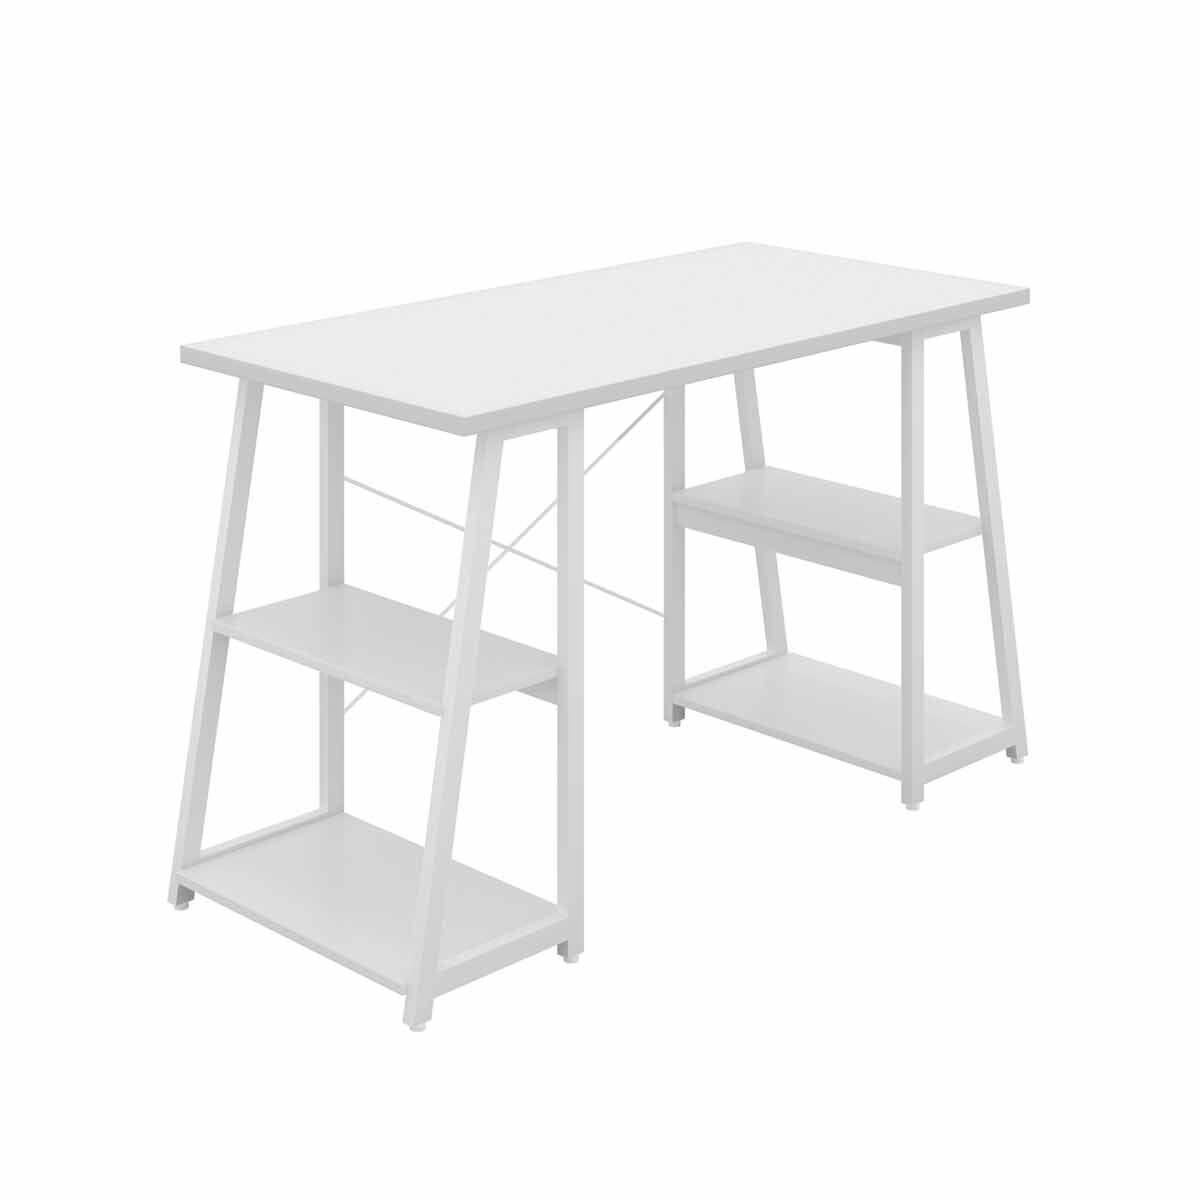 TC Office SOHO Home Working Desk with A-Frame Shelves